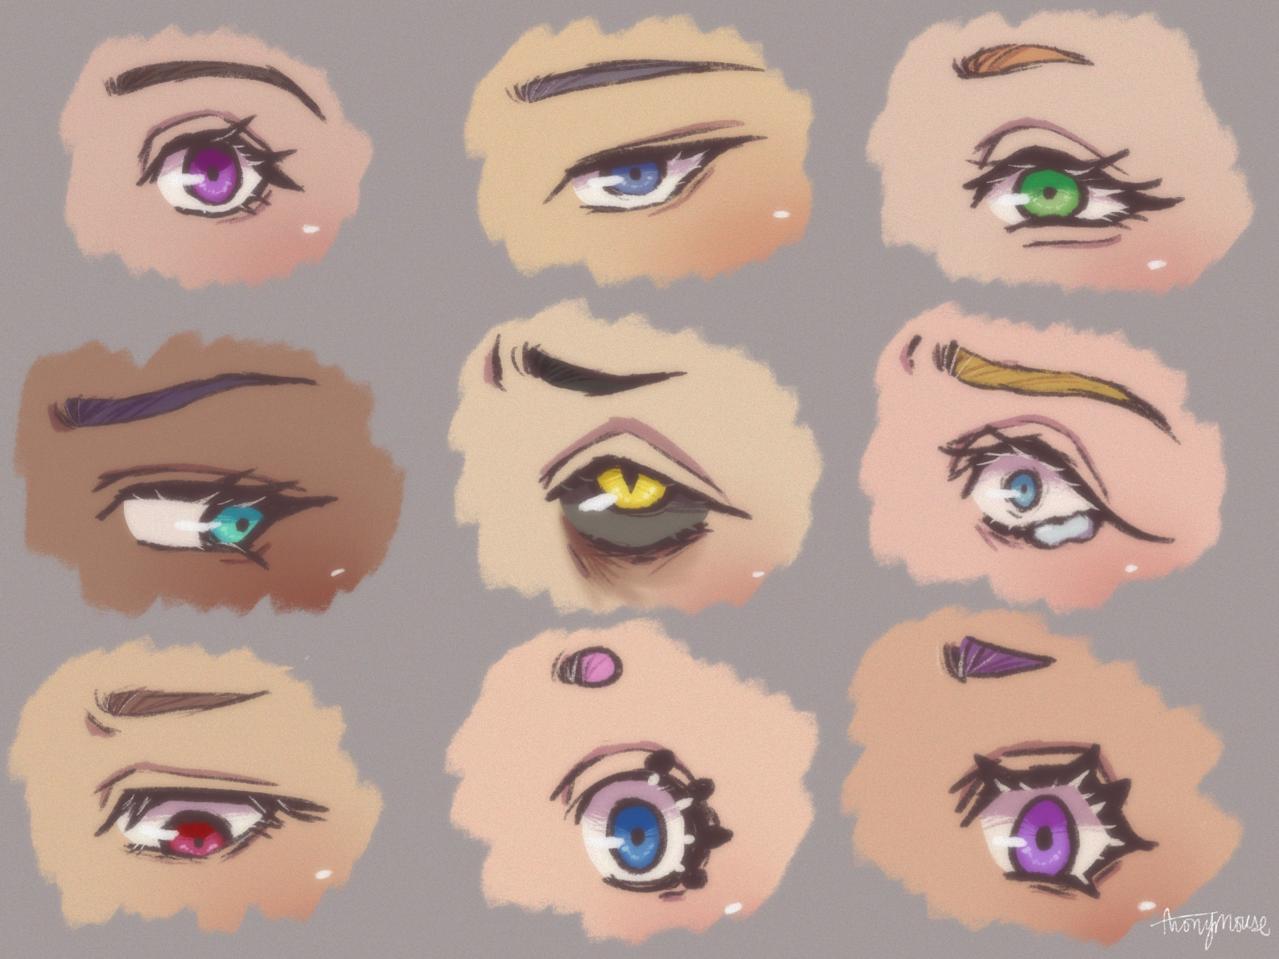 ✨eyes✨ Illust of AnonymouseSaysHoooi eyes sketch expressions daily_doodlez style cry emotions